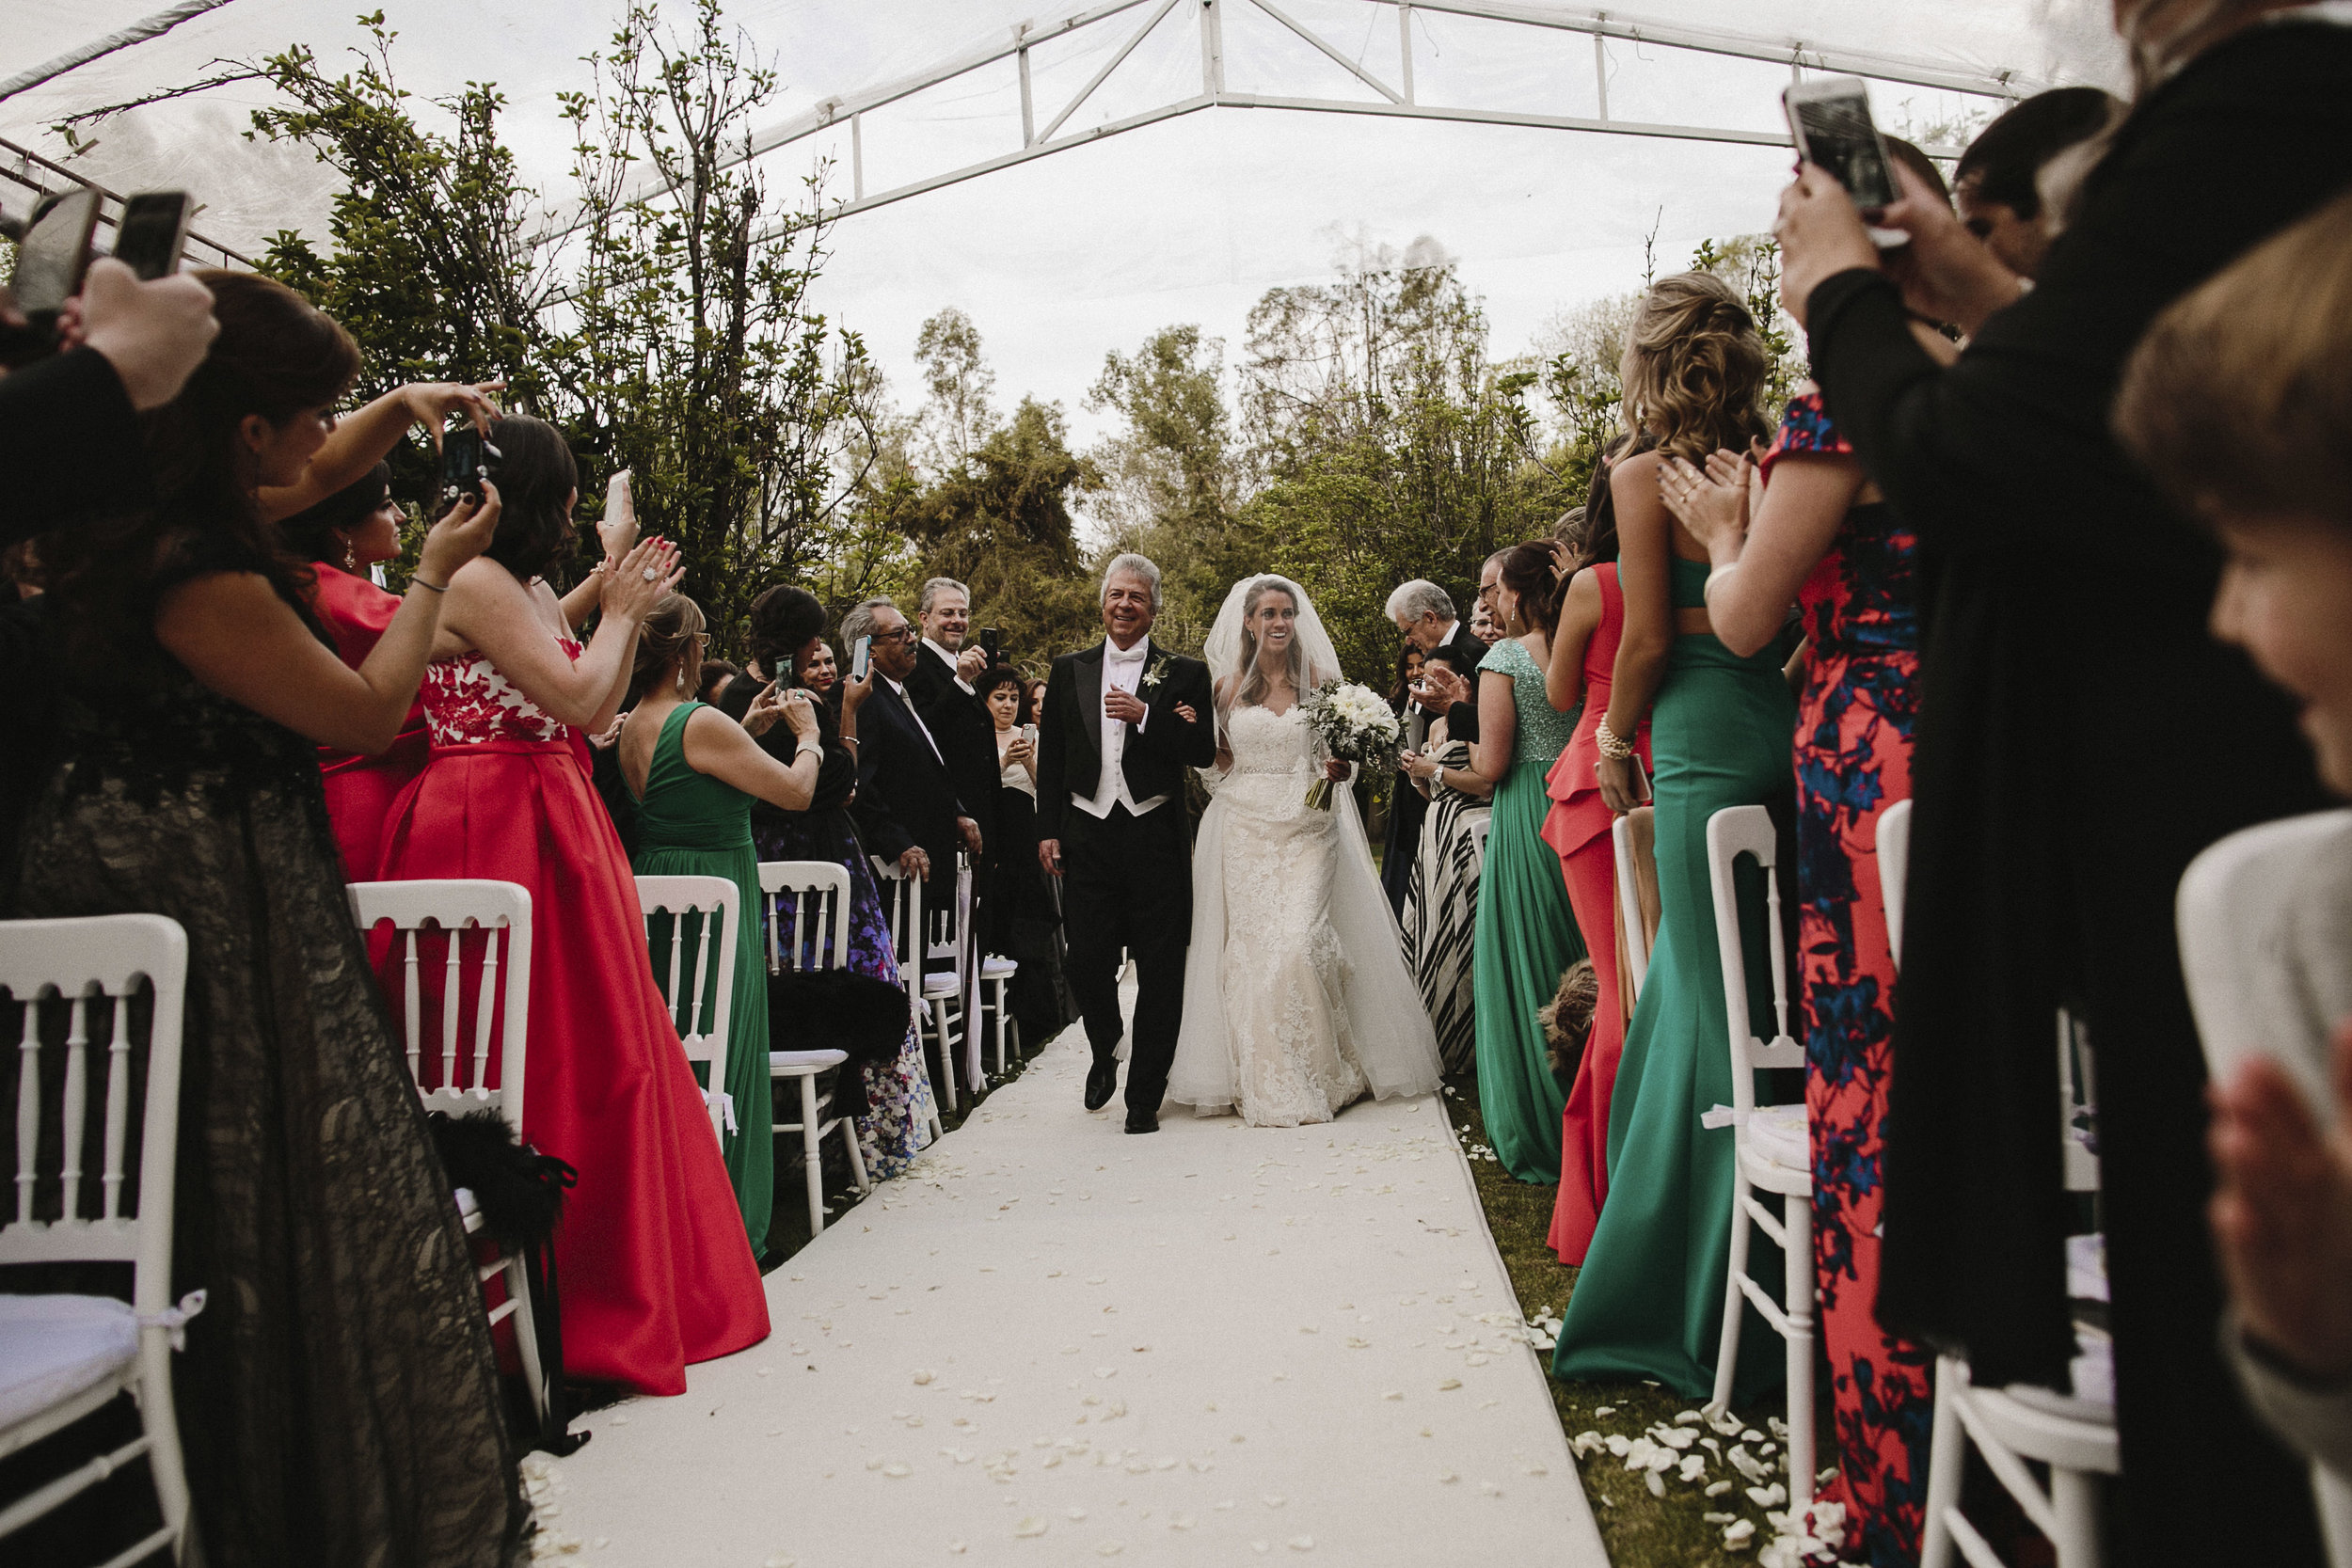 alfonso_flores_destination_wedding_photogrpahy_paola_alonso-390.JPG